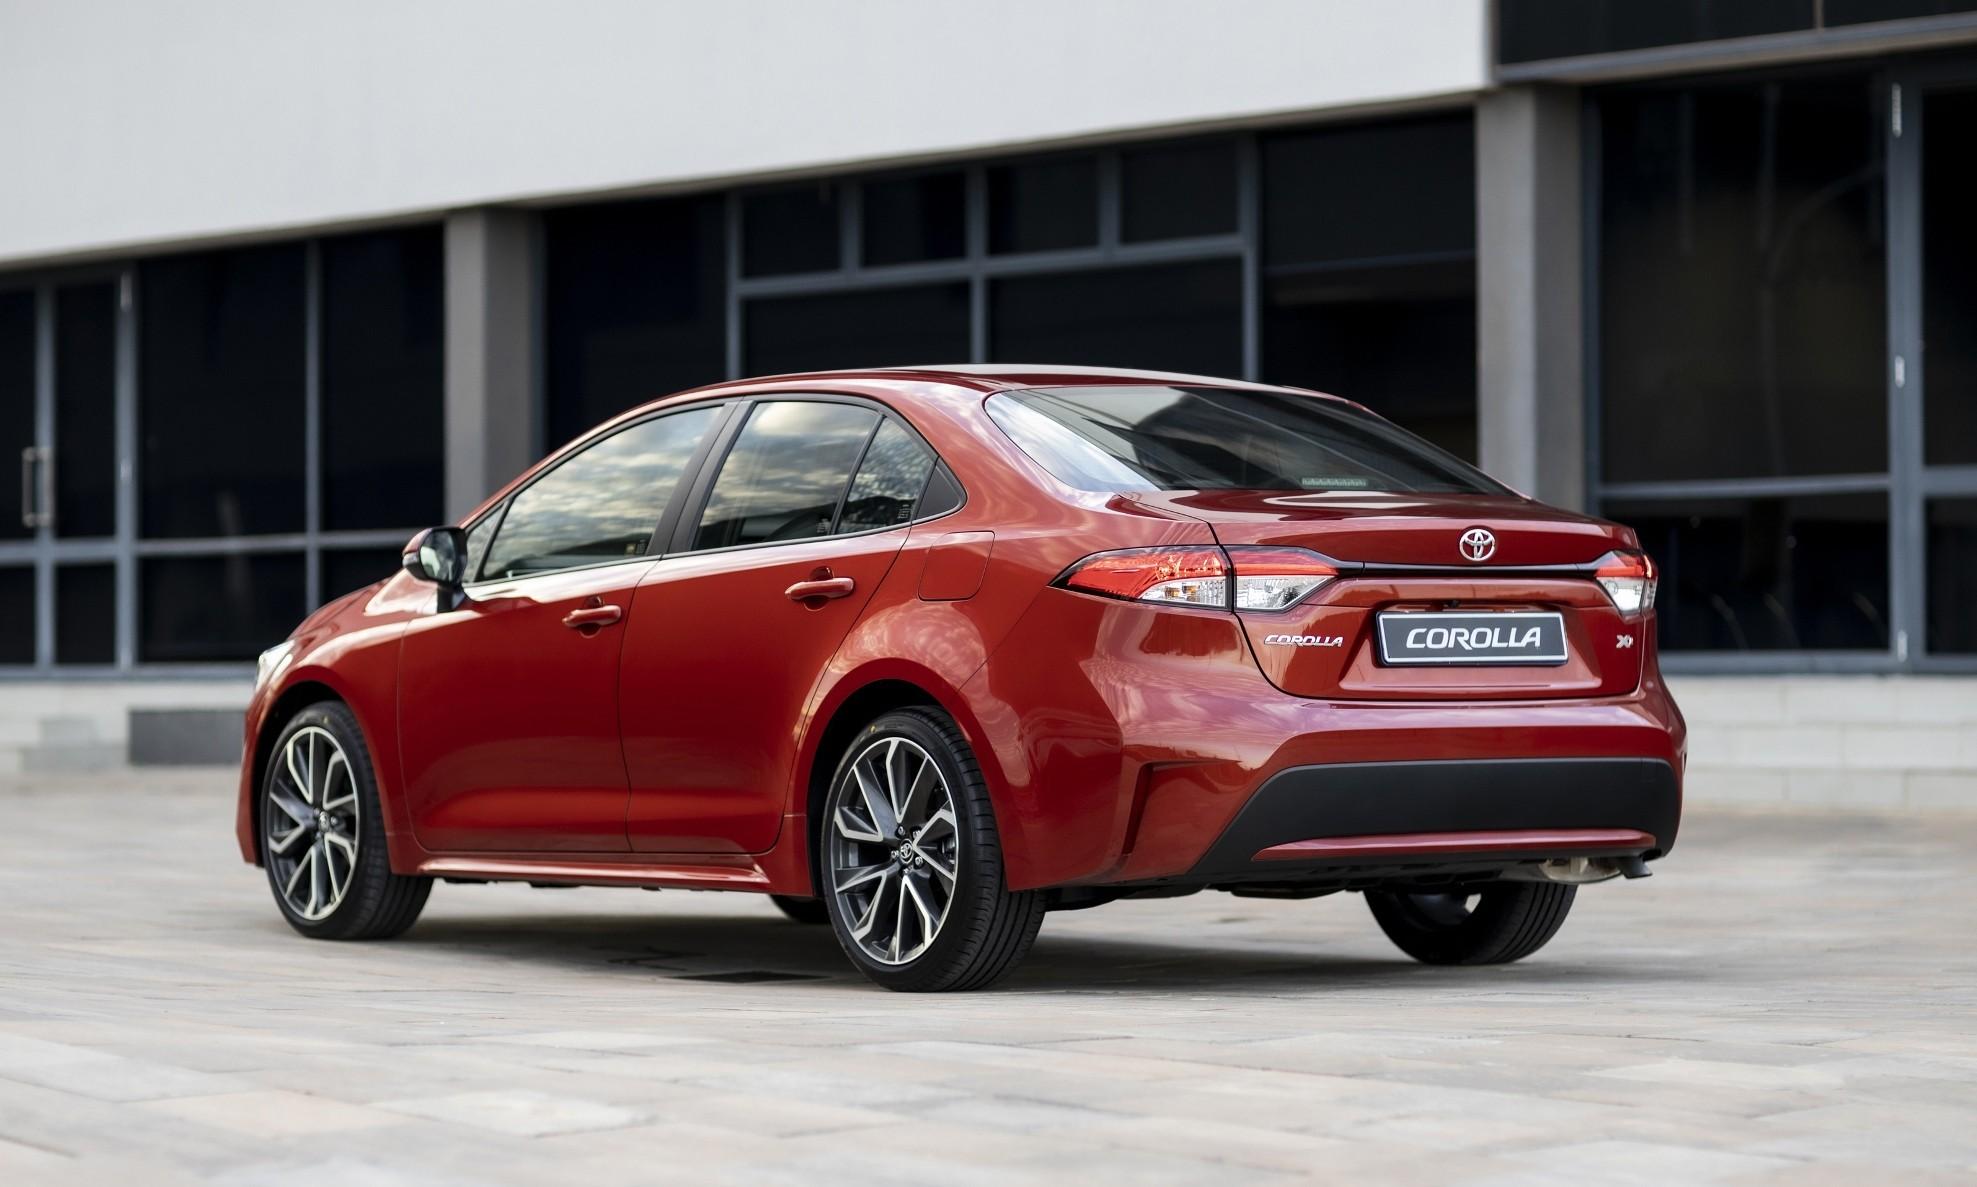 New Toyota Corolla driven